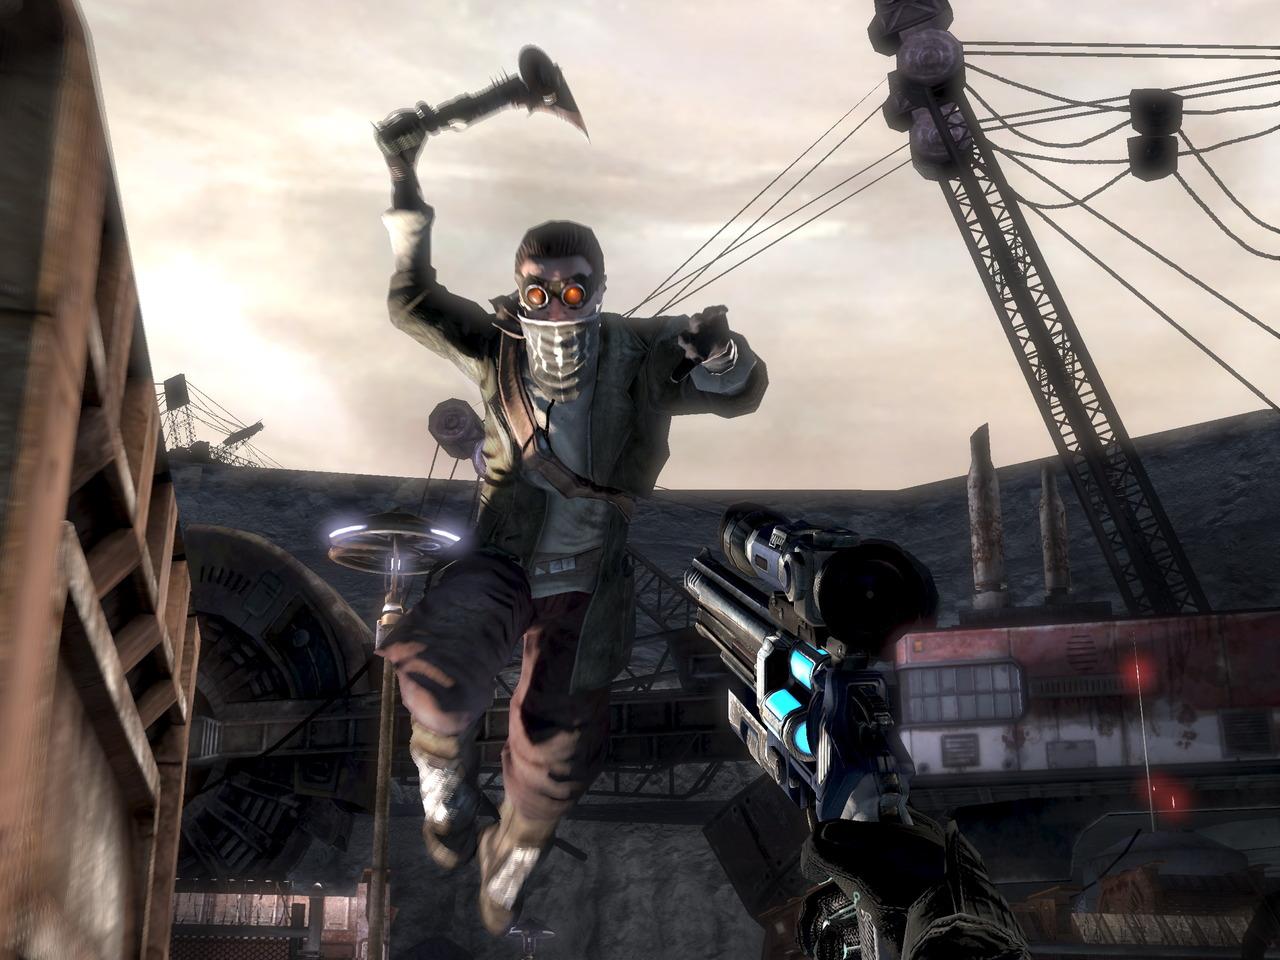 http://image.jeuxvideo.com/images/pc/o/r/ordepc001.jpg